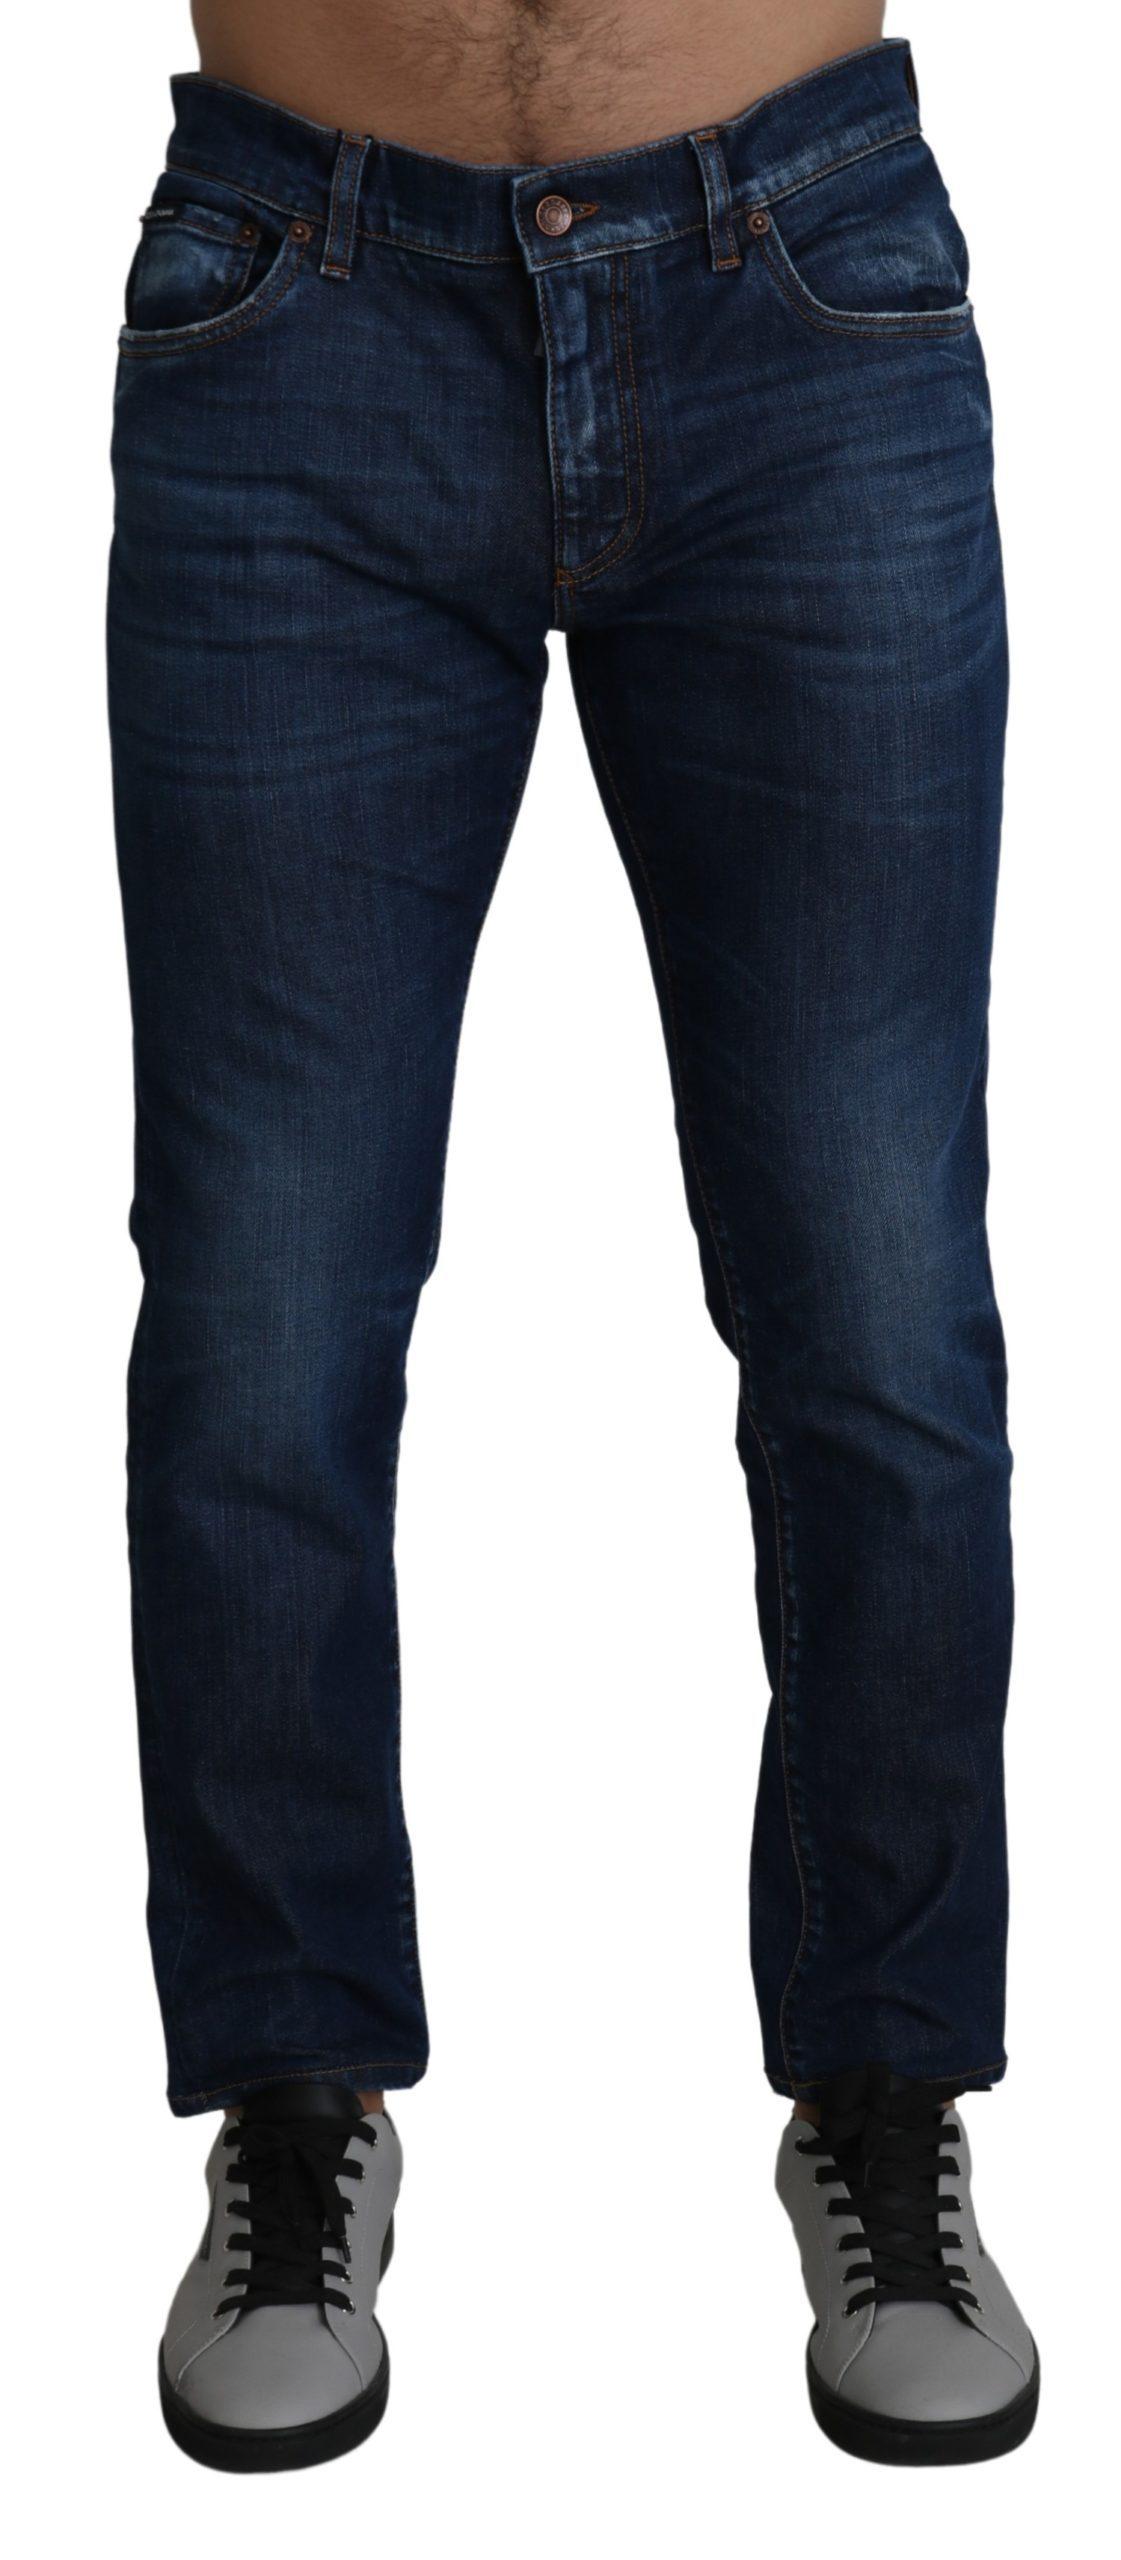 Dolce & Gabbana Men's Washed Skinny Denim Stretch Jeans Blue PAN71401 - IT52 | XL